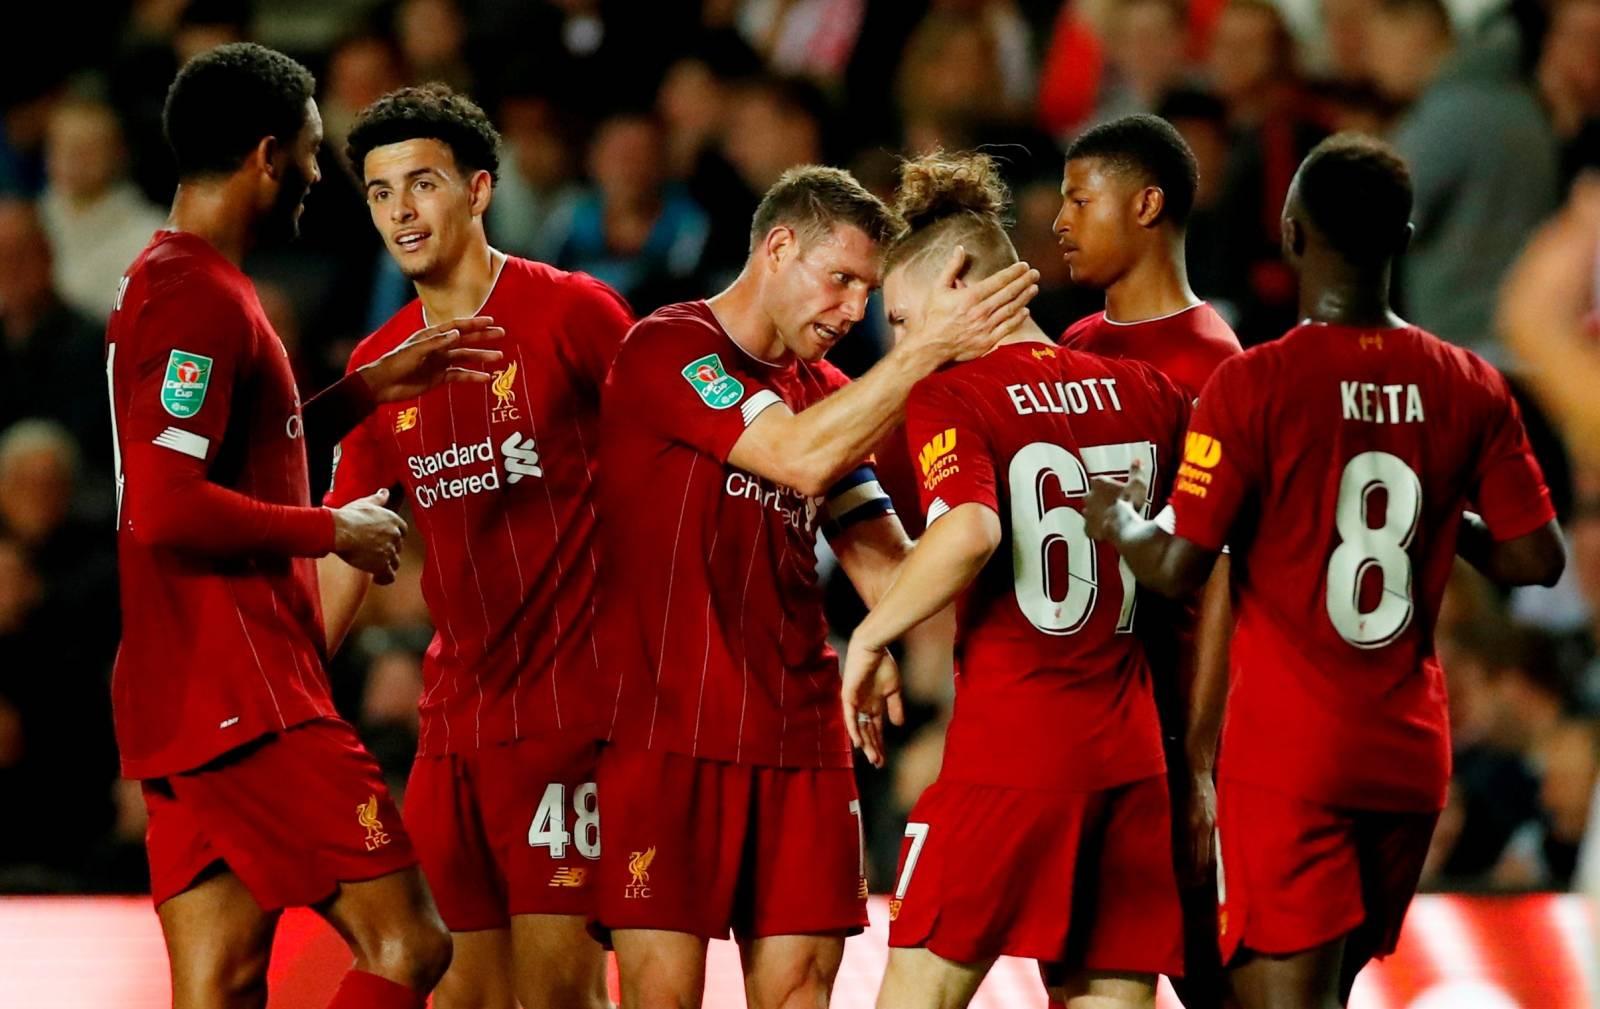 Carabao Cup - Third Round - Milton Keynes Dons v Liverpool